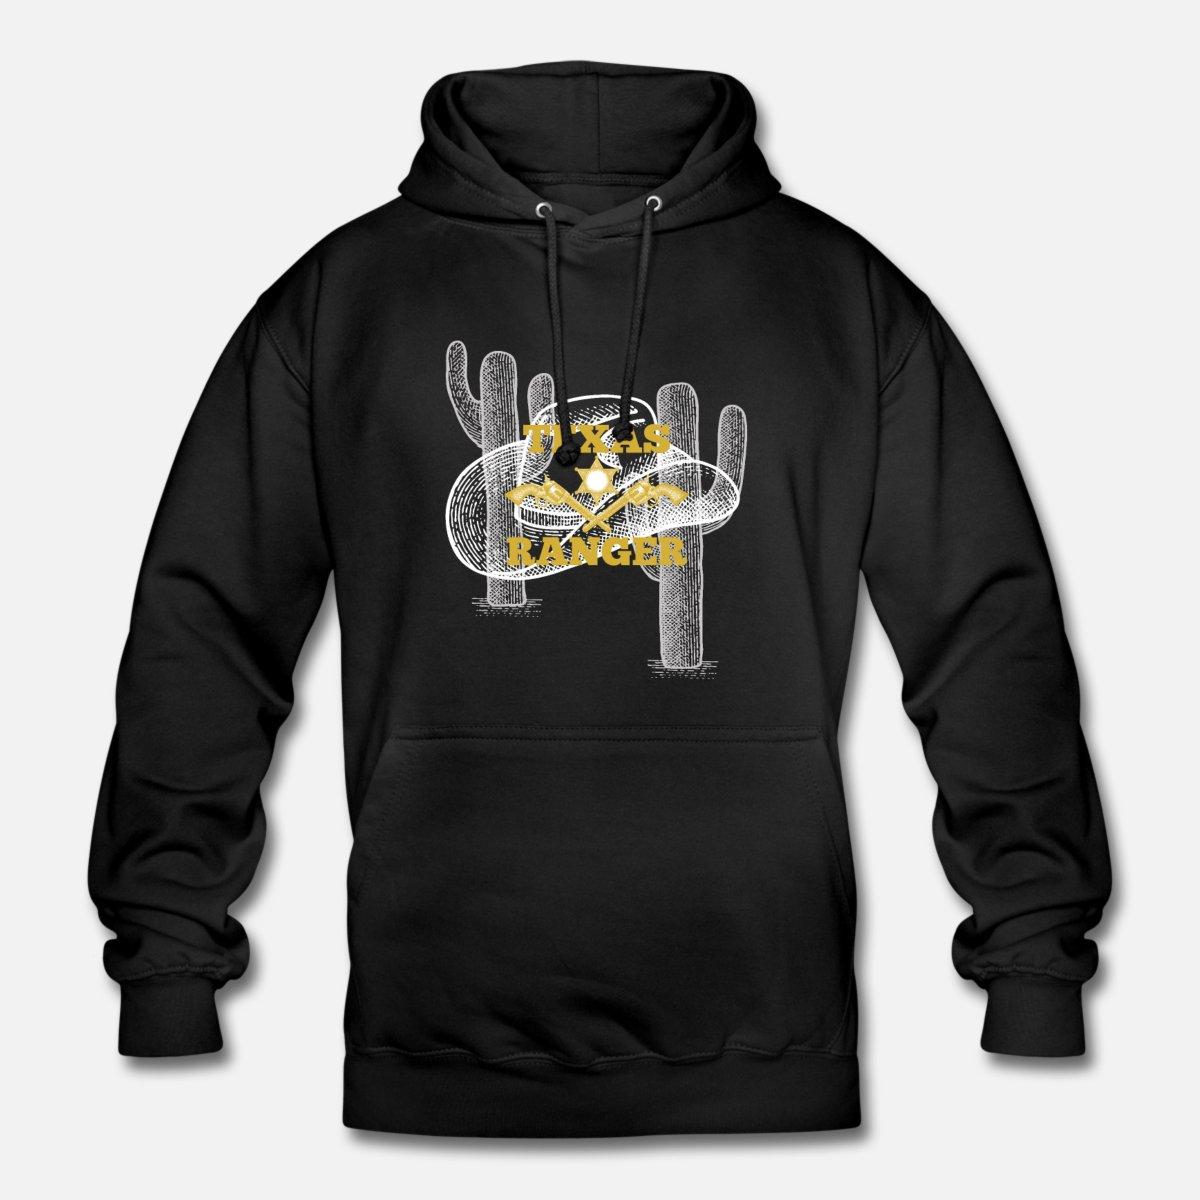 western-style-texas-ranger-geschenkidee-unisex-hoodie